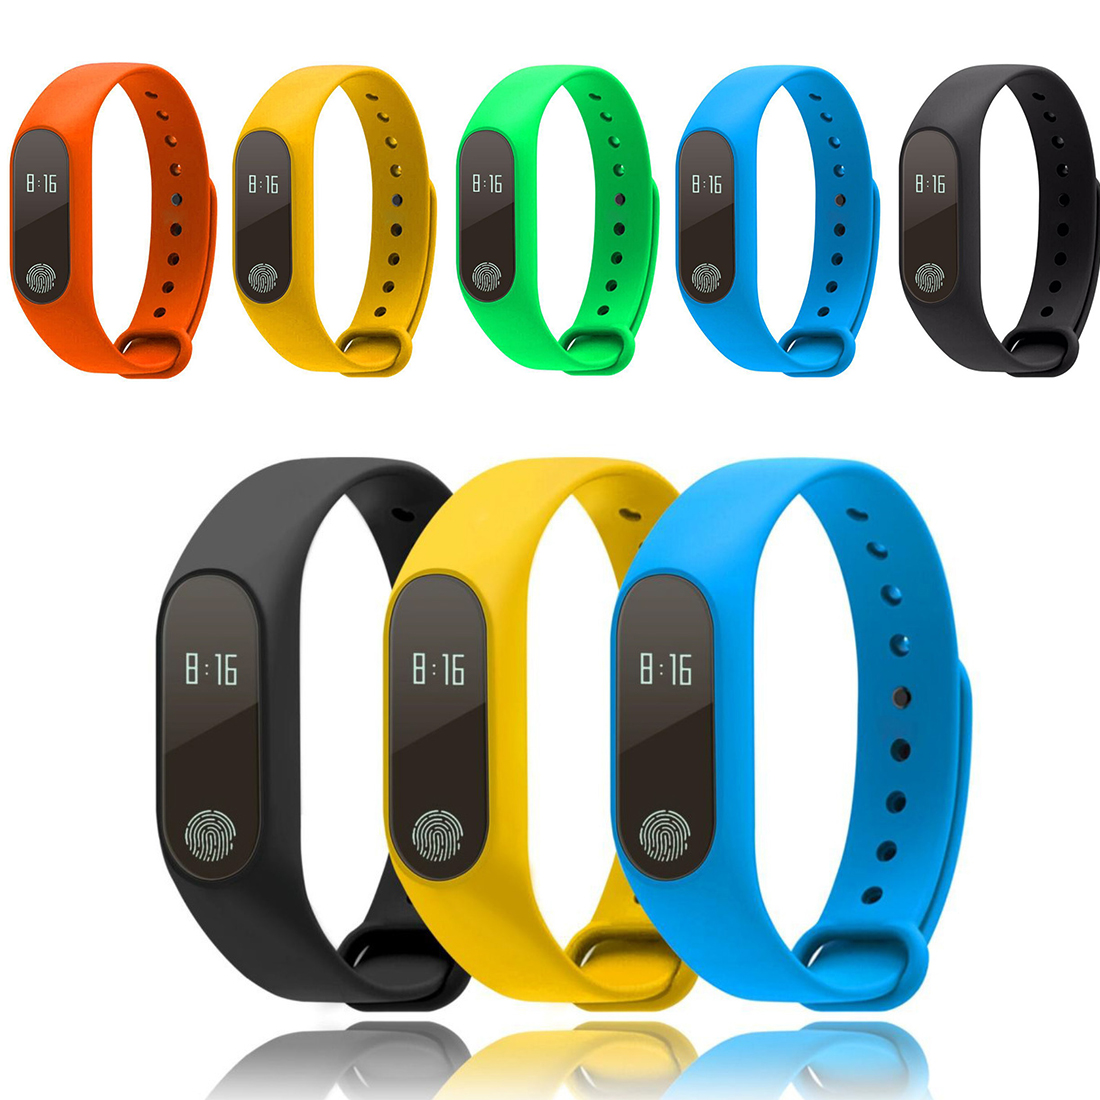 Digital LCD Schrittzähler Walking Handgelenk Sport Fitness Uhr Armband Display Sport Tracker Laufen Schritt Kalorien Zähler